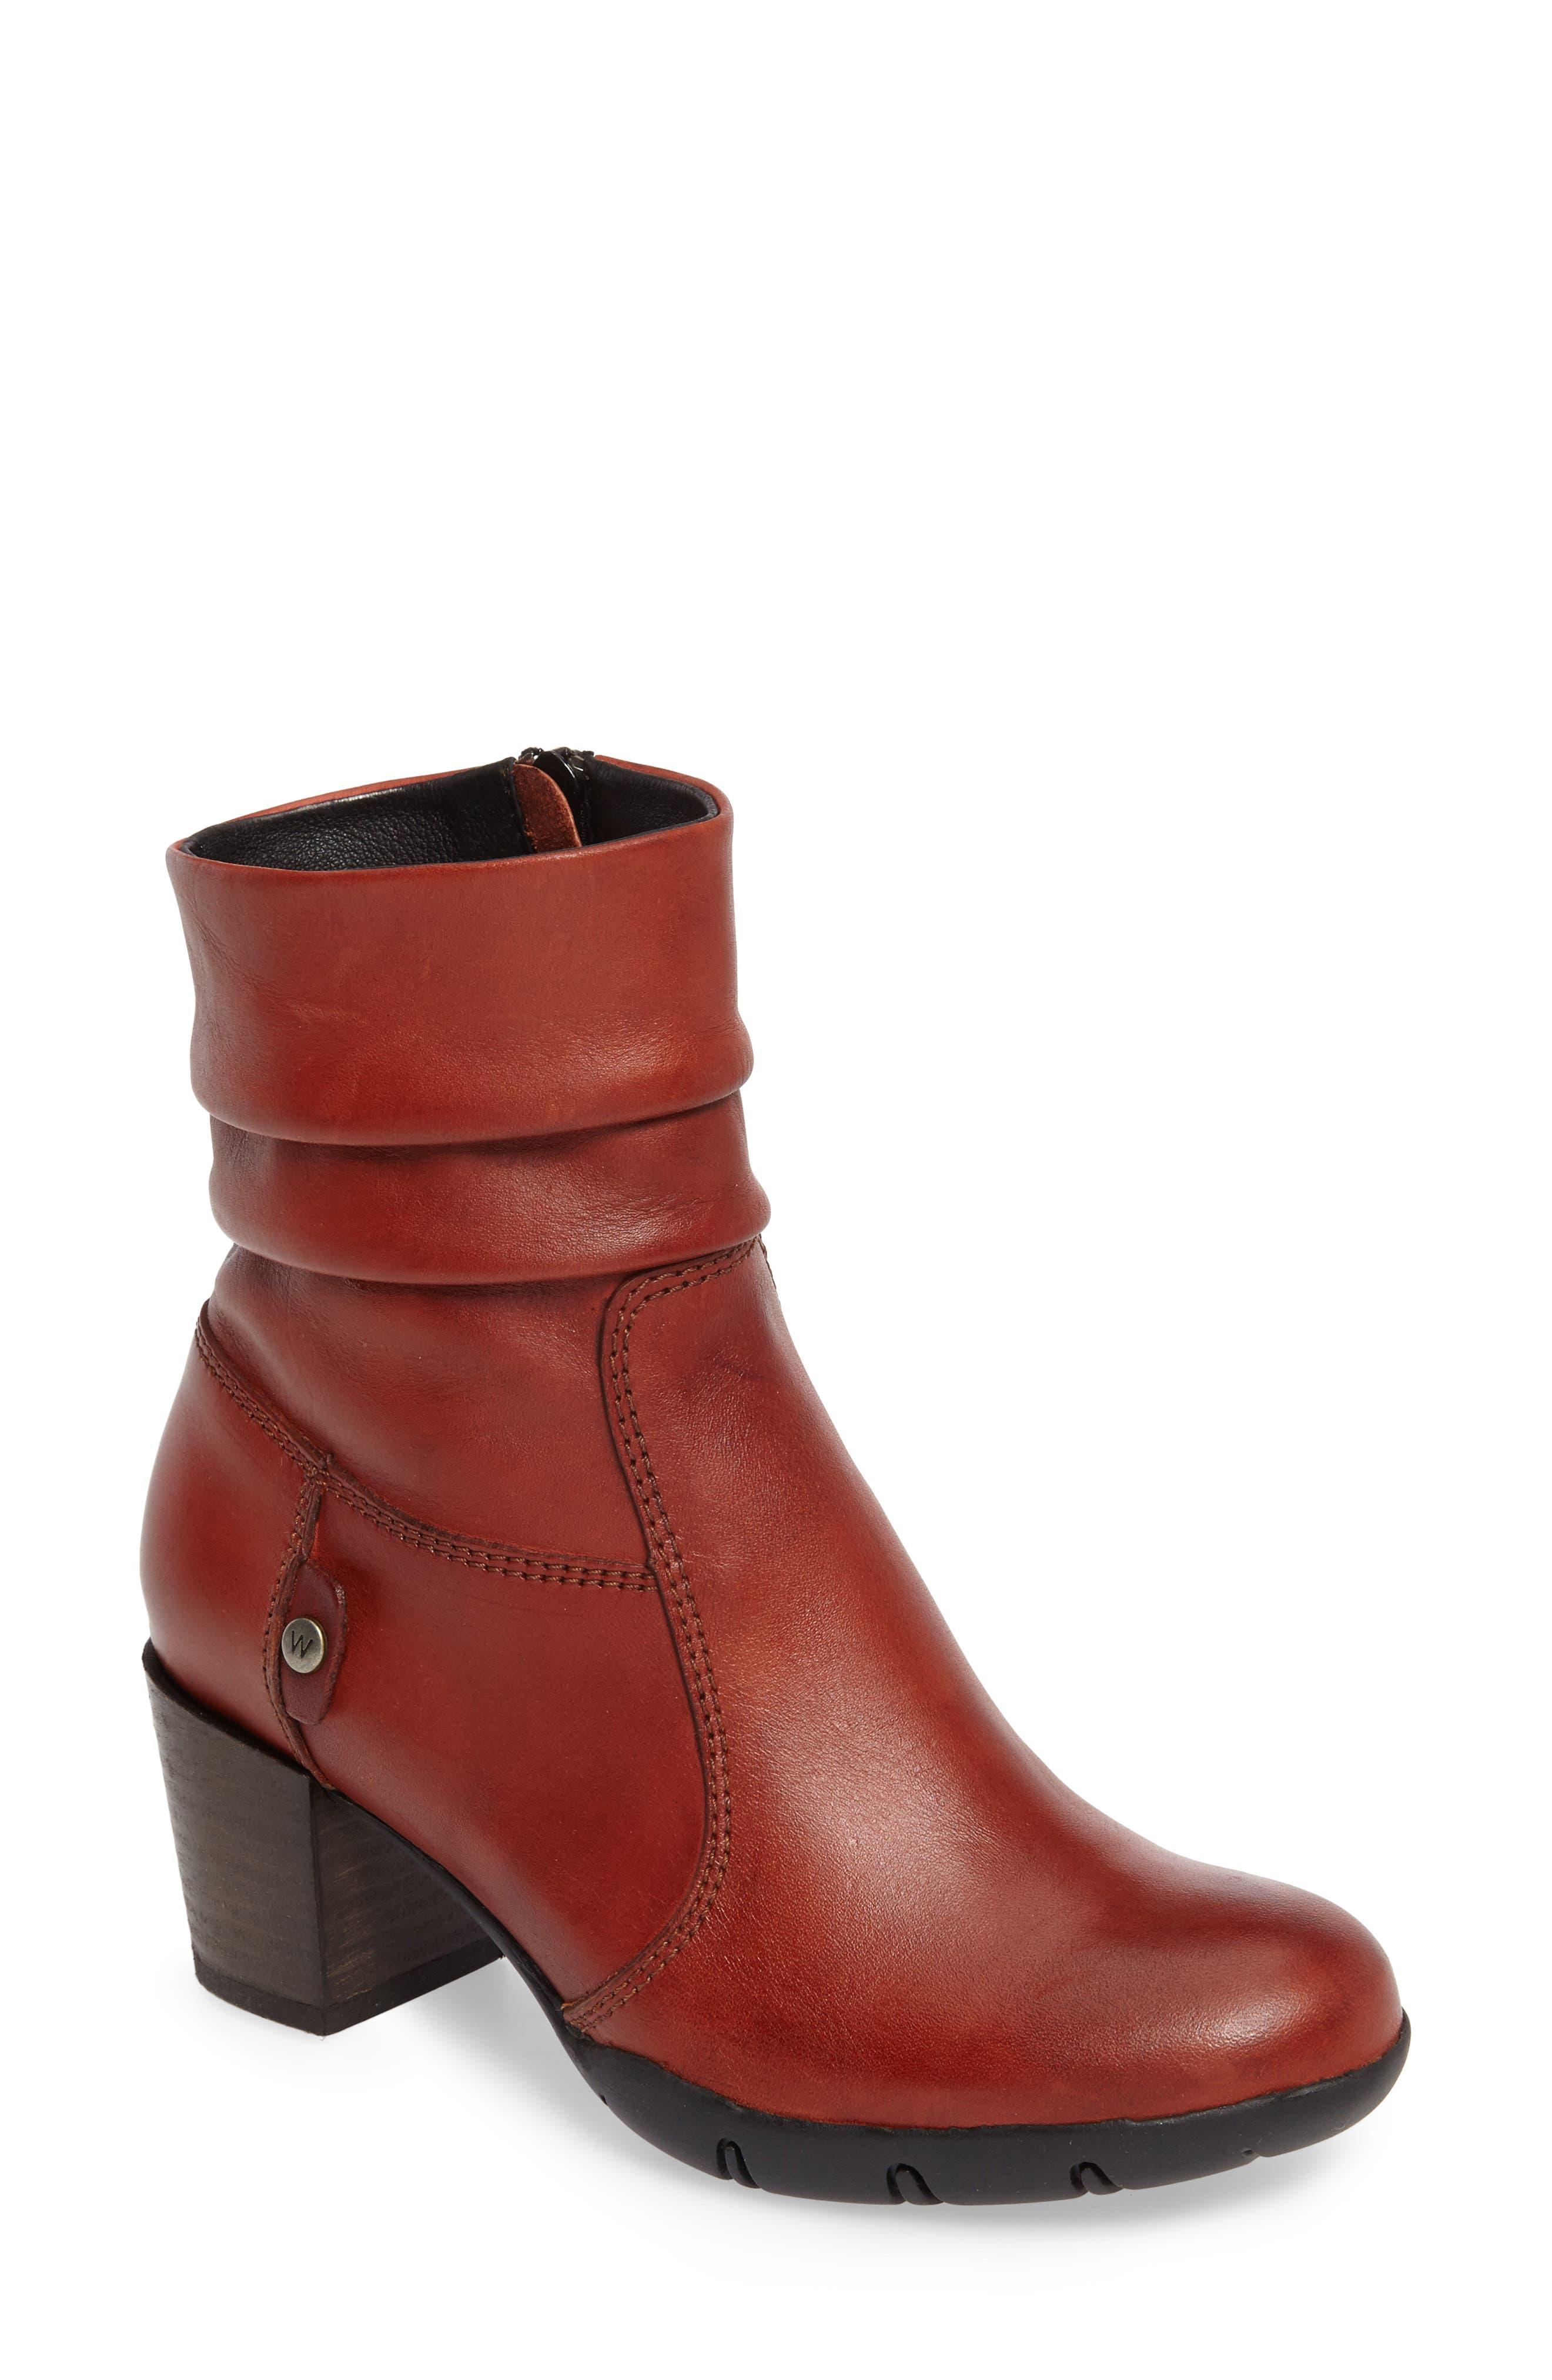 Wolky Colville Boot (Women)